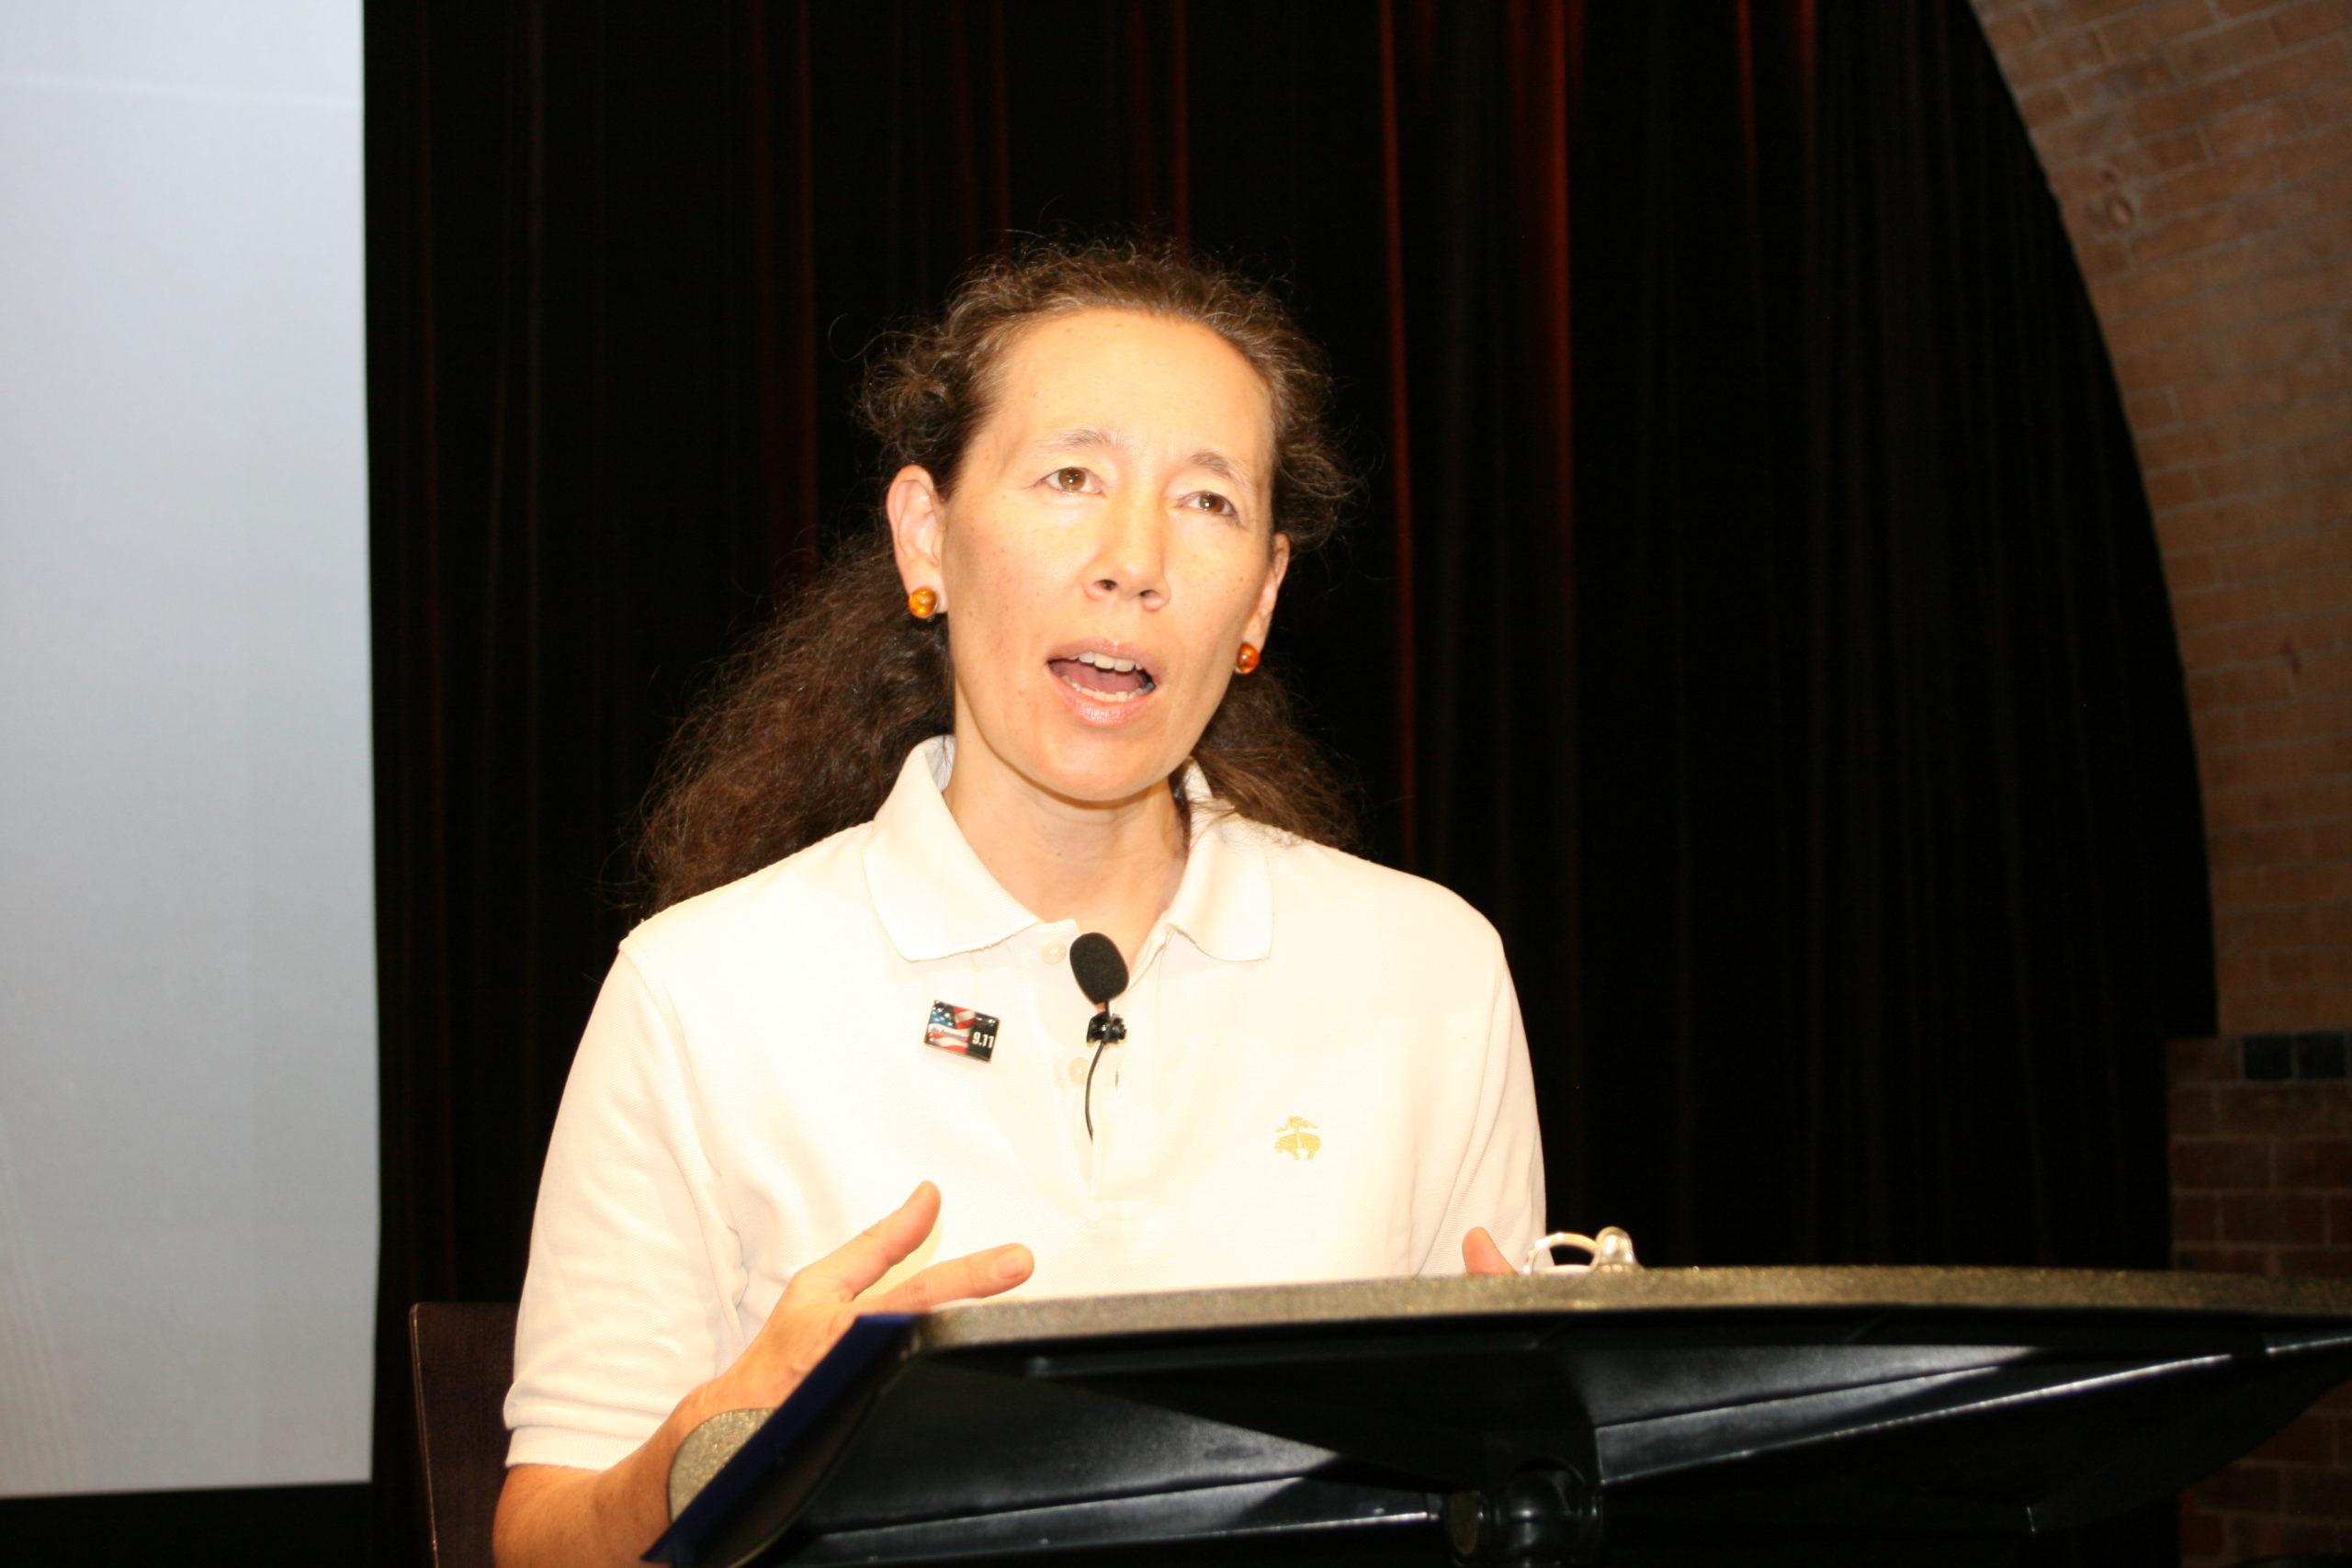 Gail Langsner